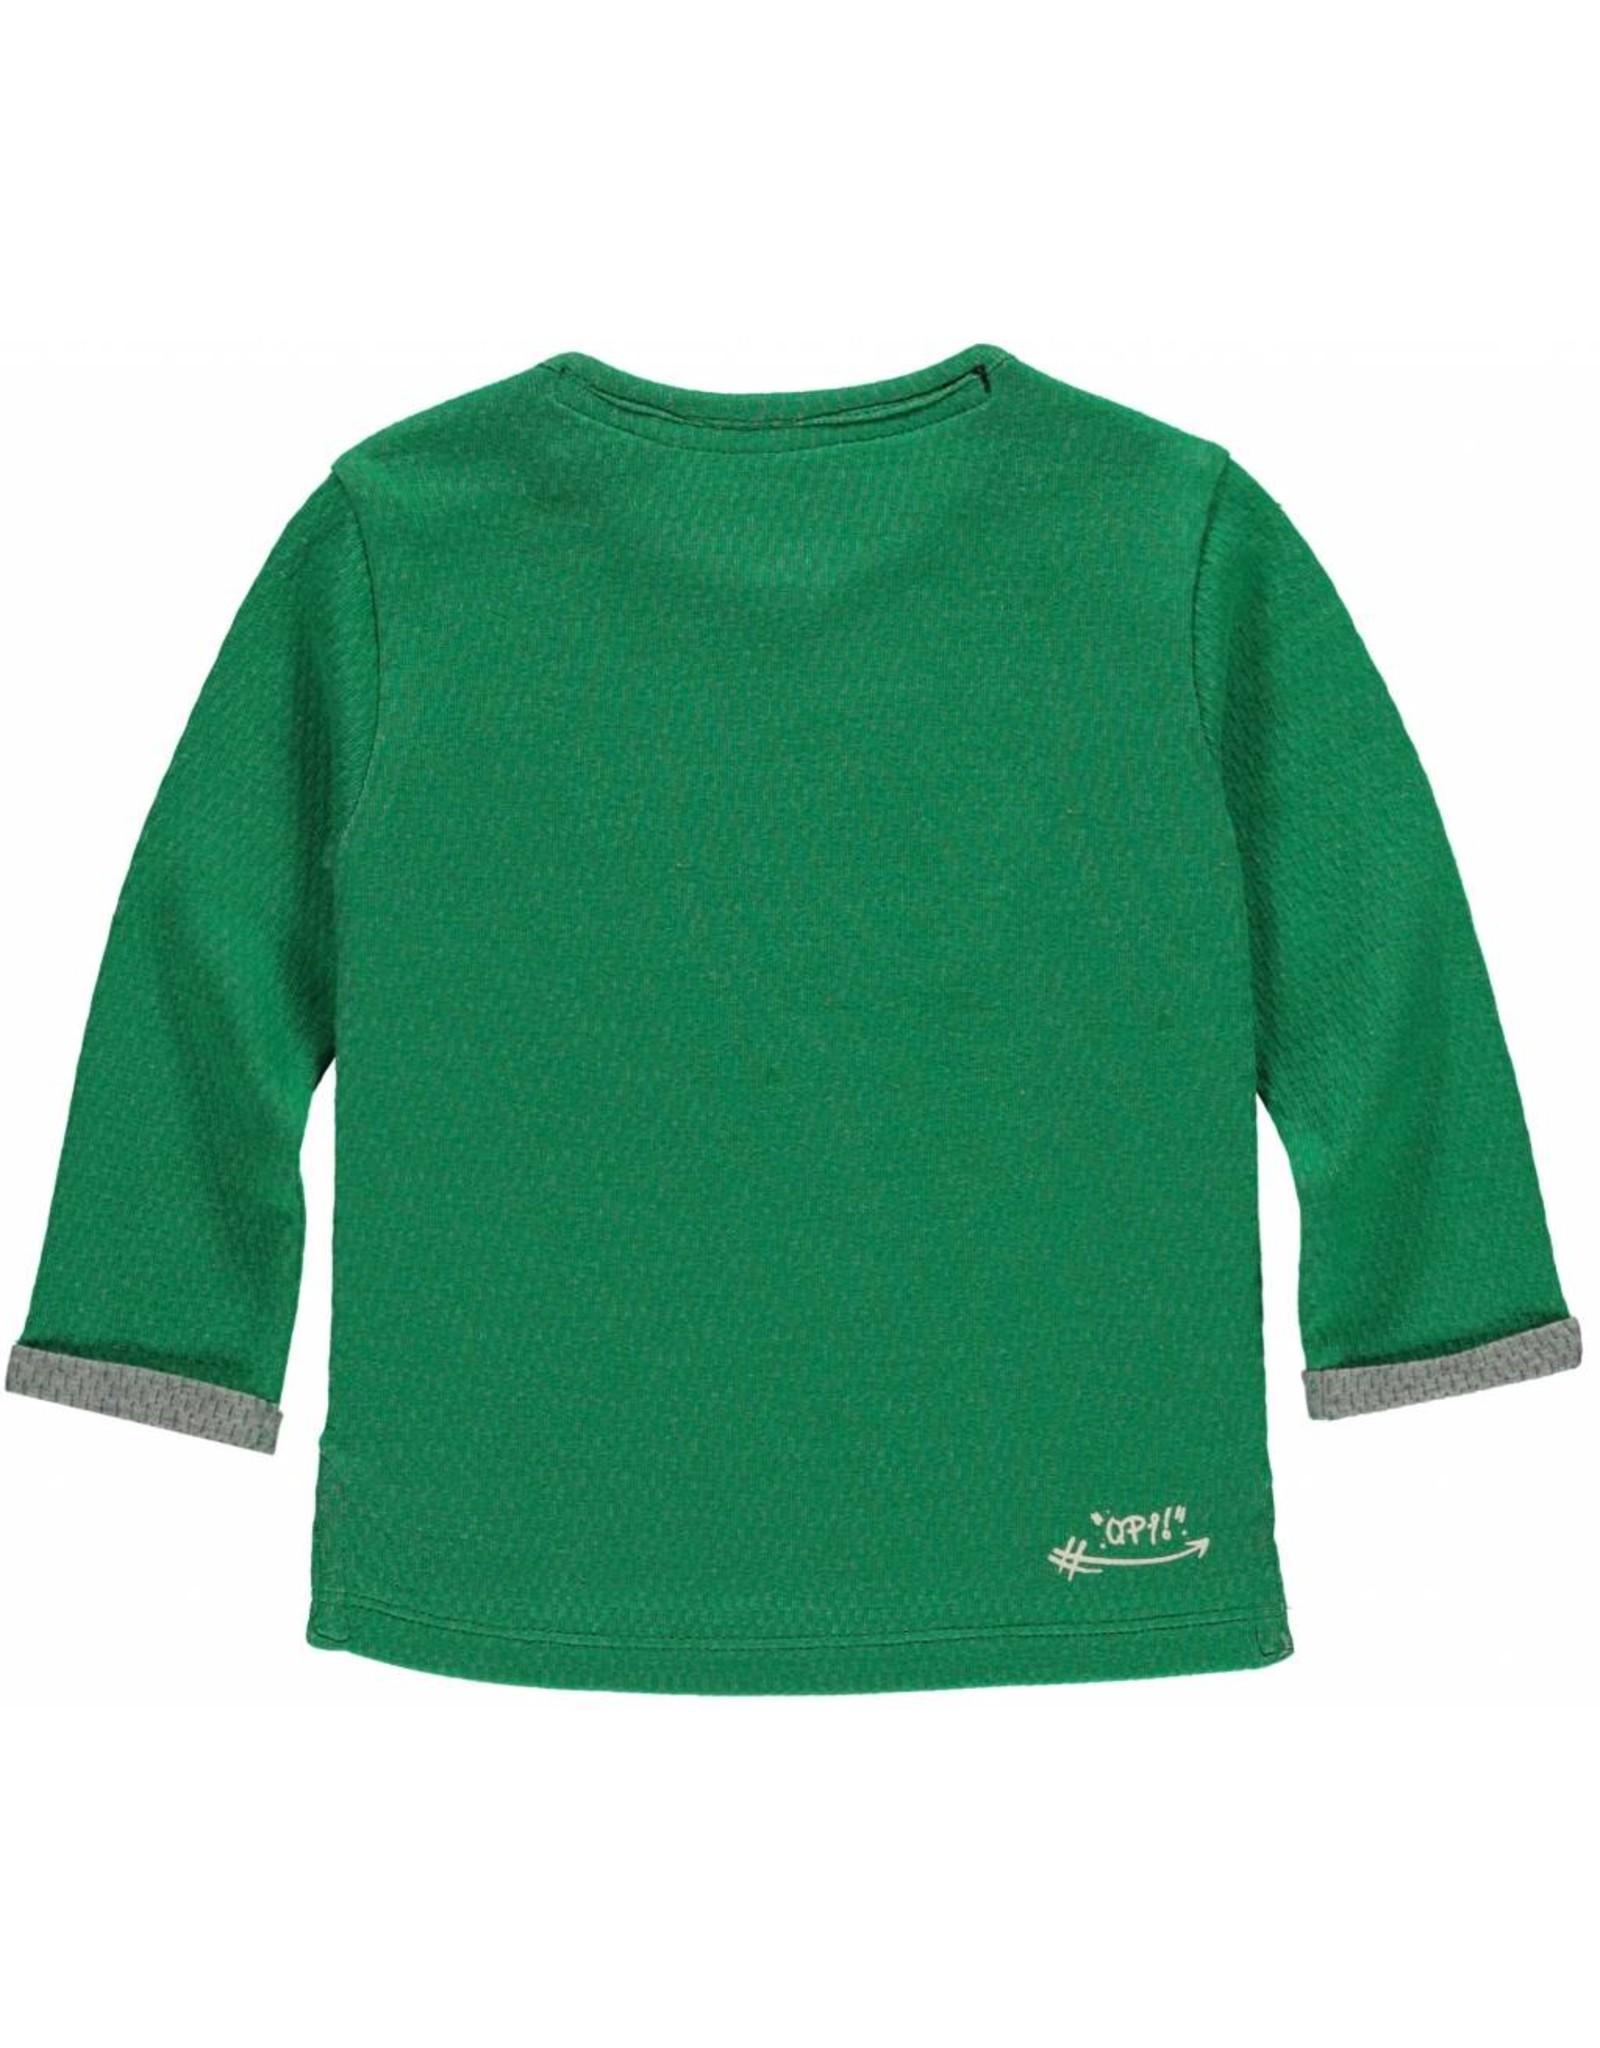 Quapi Quapi baby jongens shirt MAROUAN